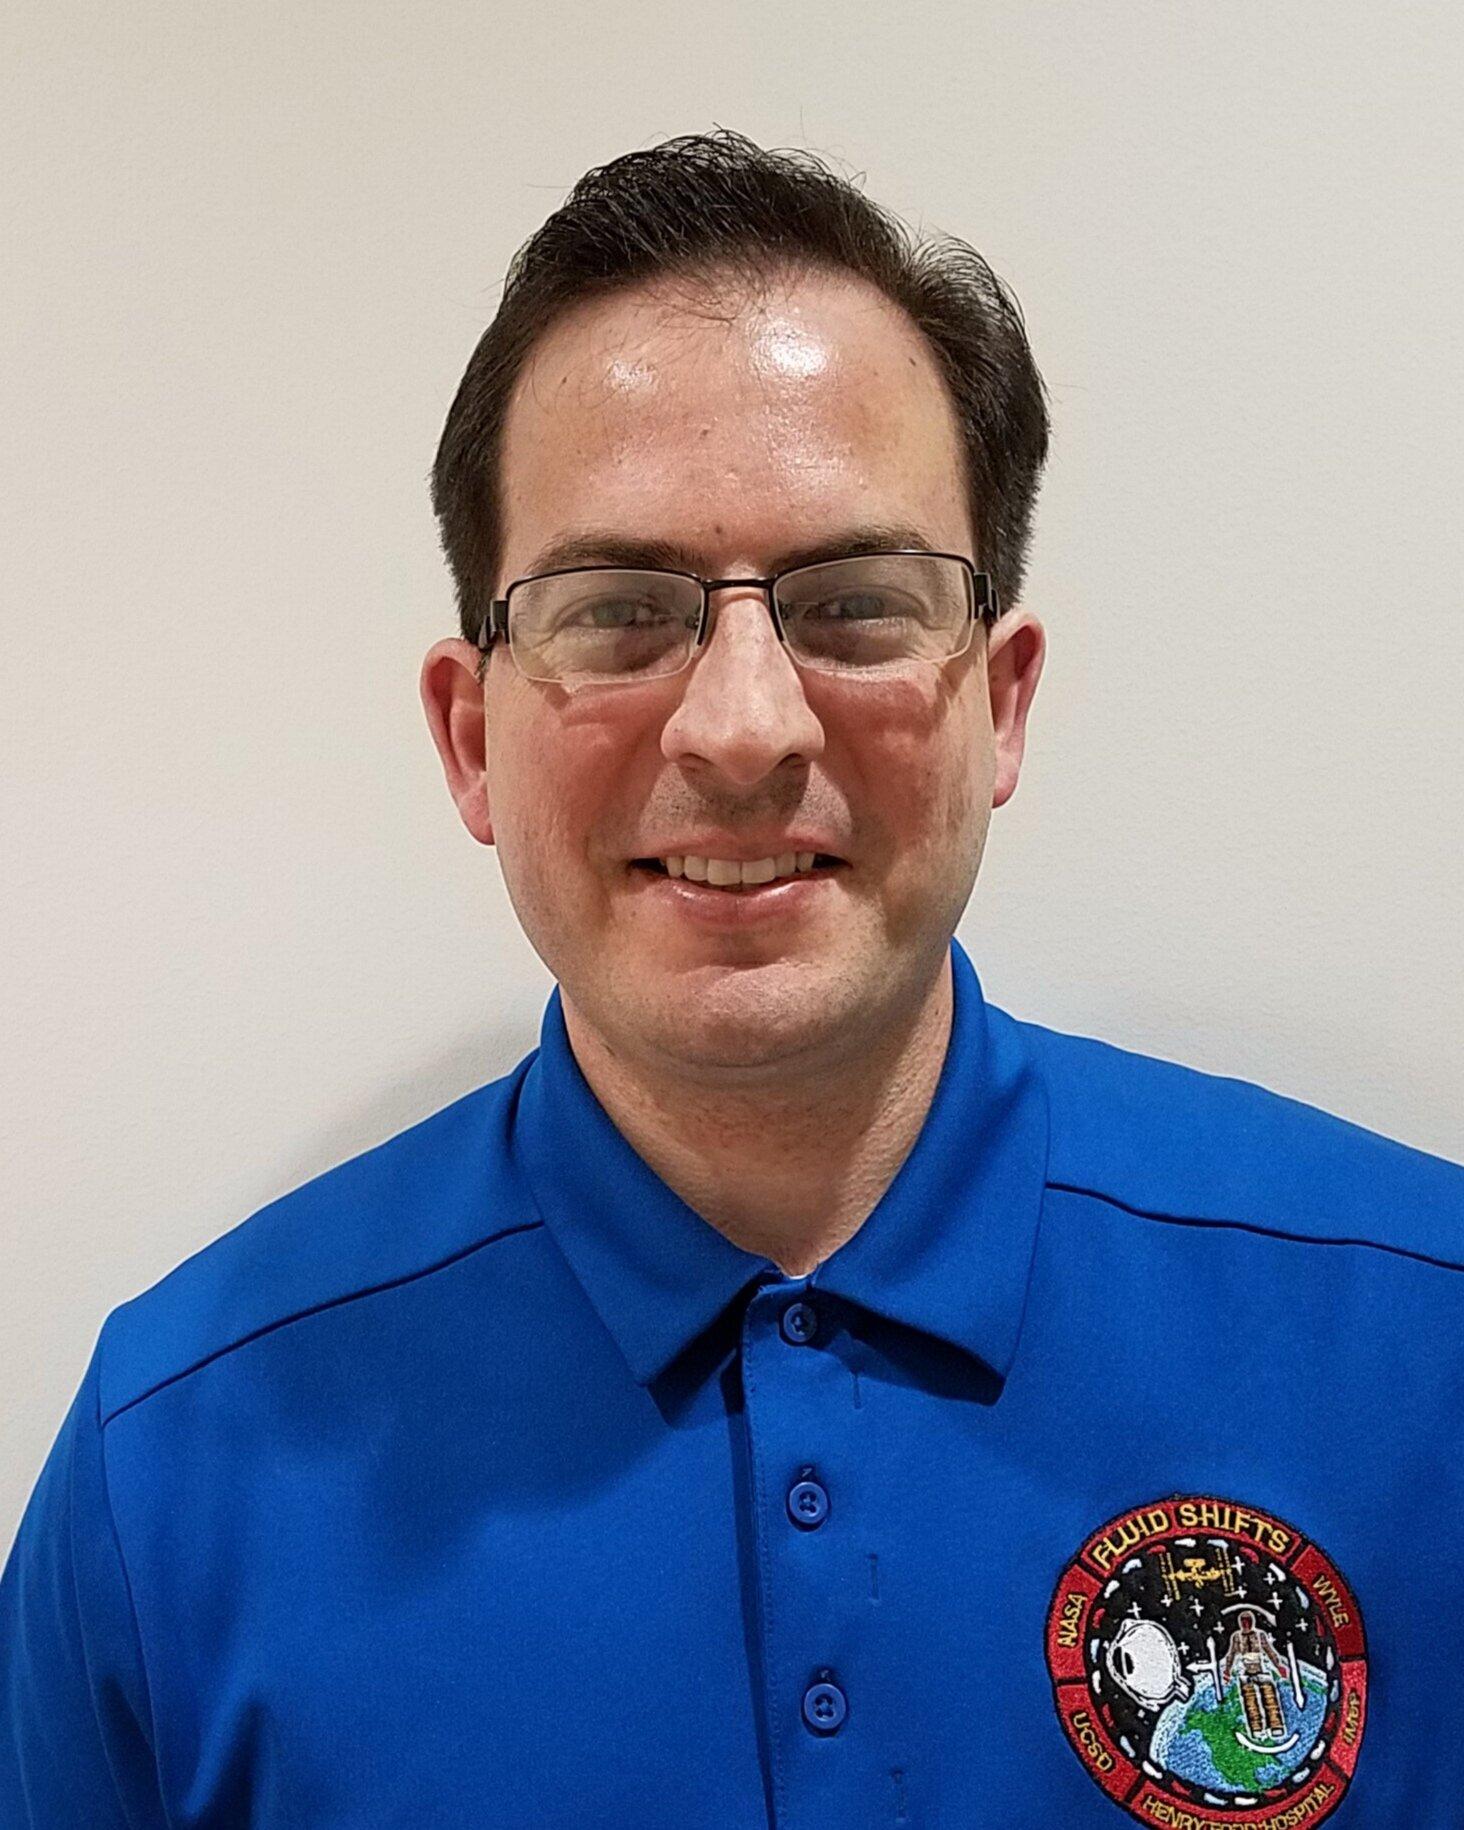 MOST PROMISINGSCIENTIST -PH.D.Brandon R.Macias - Senior ScientistLead Cardiovascular and Vision LaboratoryNASA Johnson Space Center